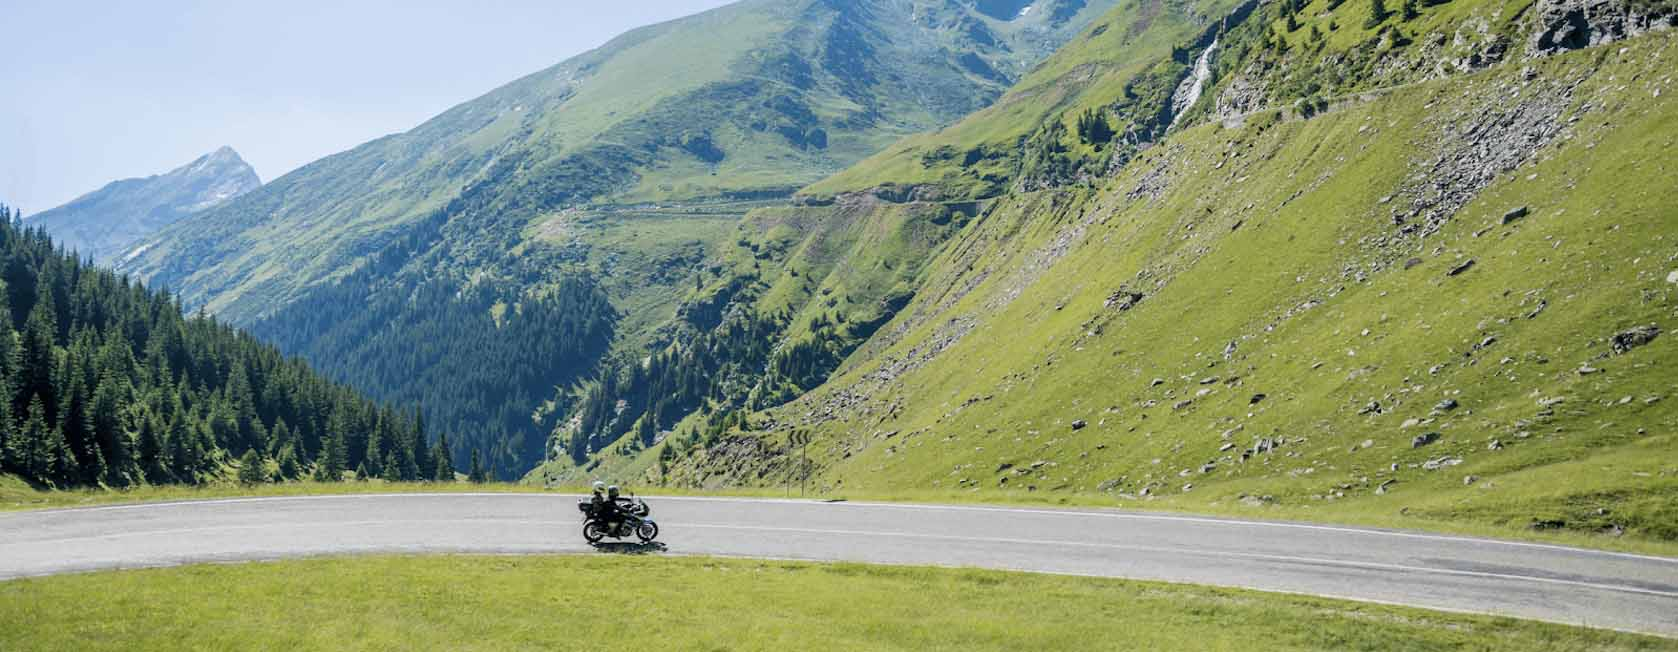 long-distance-motorcycle.jpg